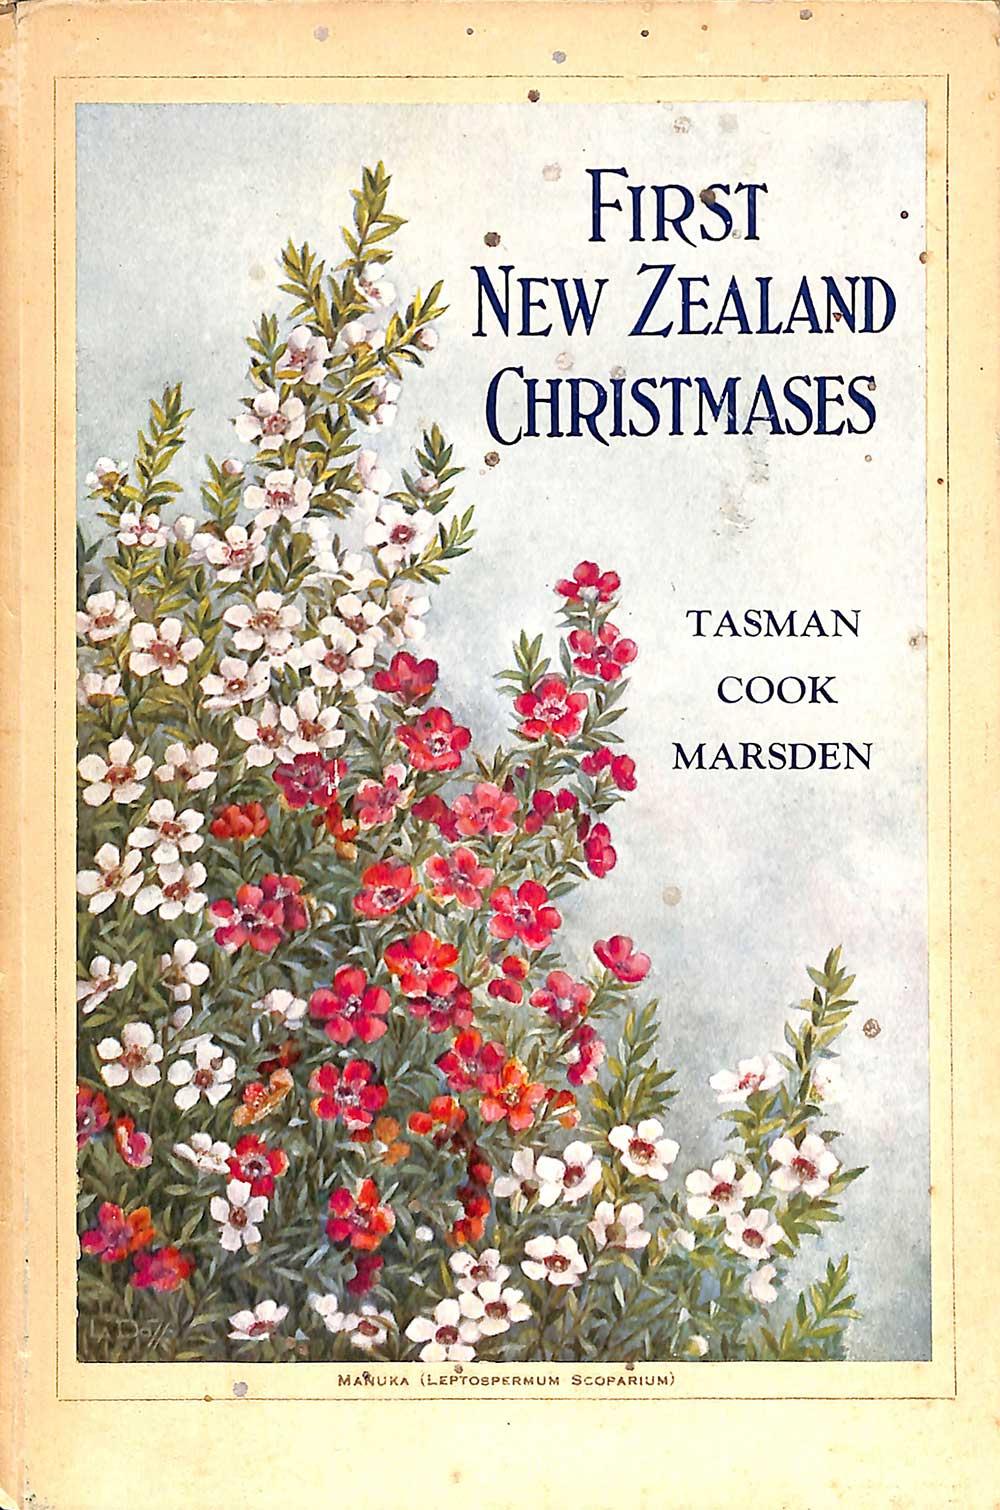 A.H. & A.W. Reed. <em>First New Zealand Christmases.</em> Dunedin: A.H. Reed, 1933.